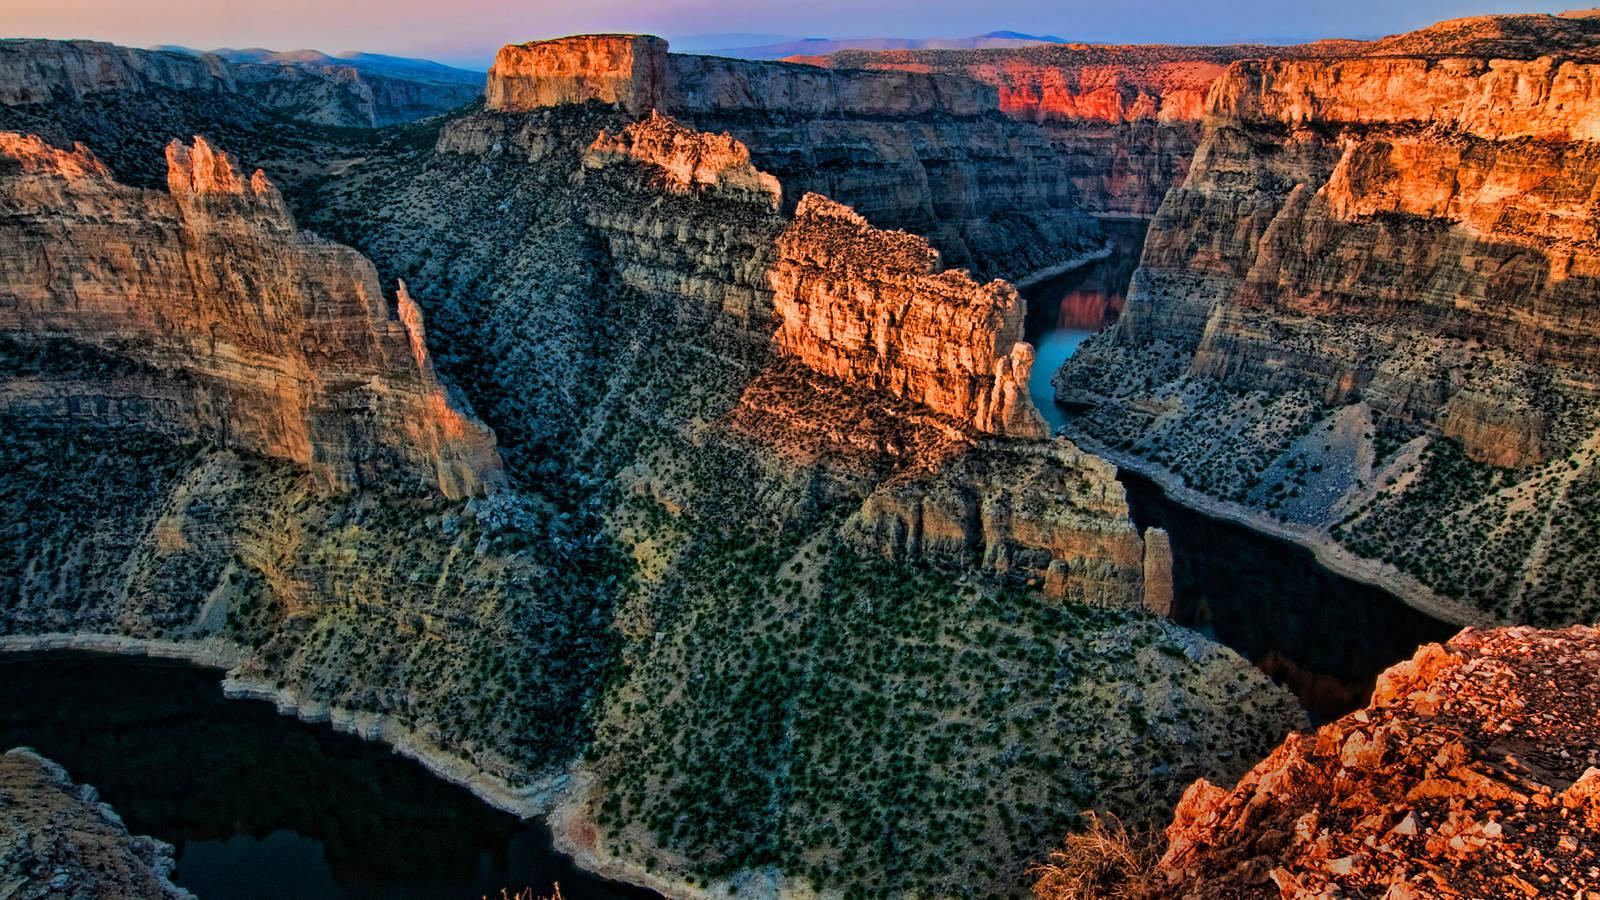 Bighorn Canyon u00b7 National Parks Conservation Association